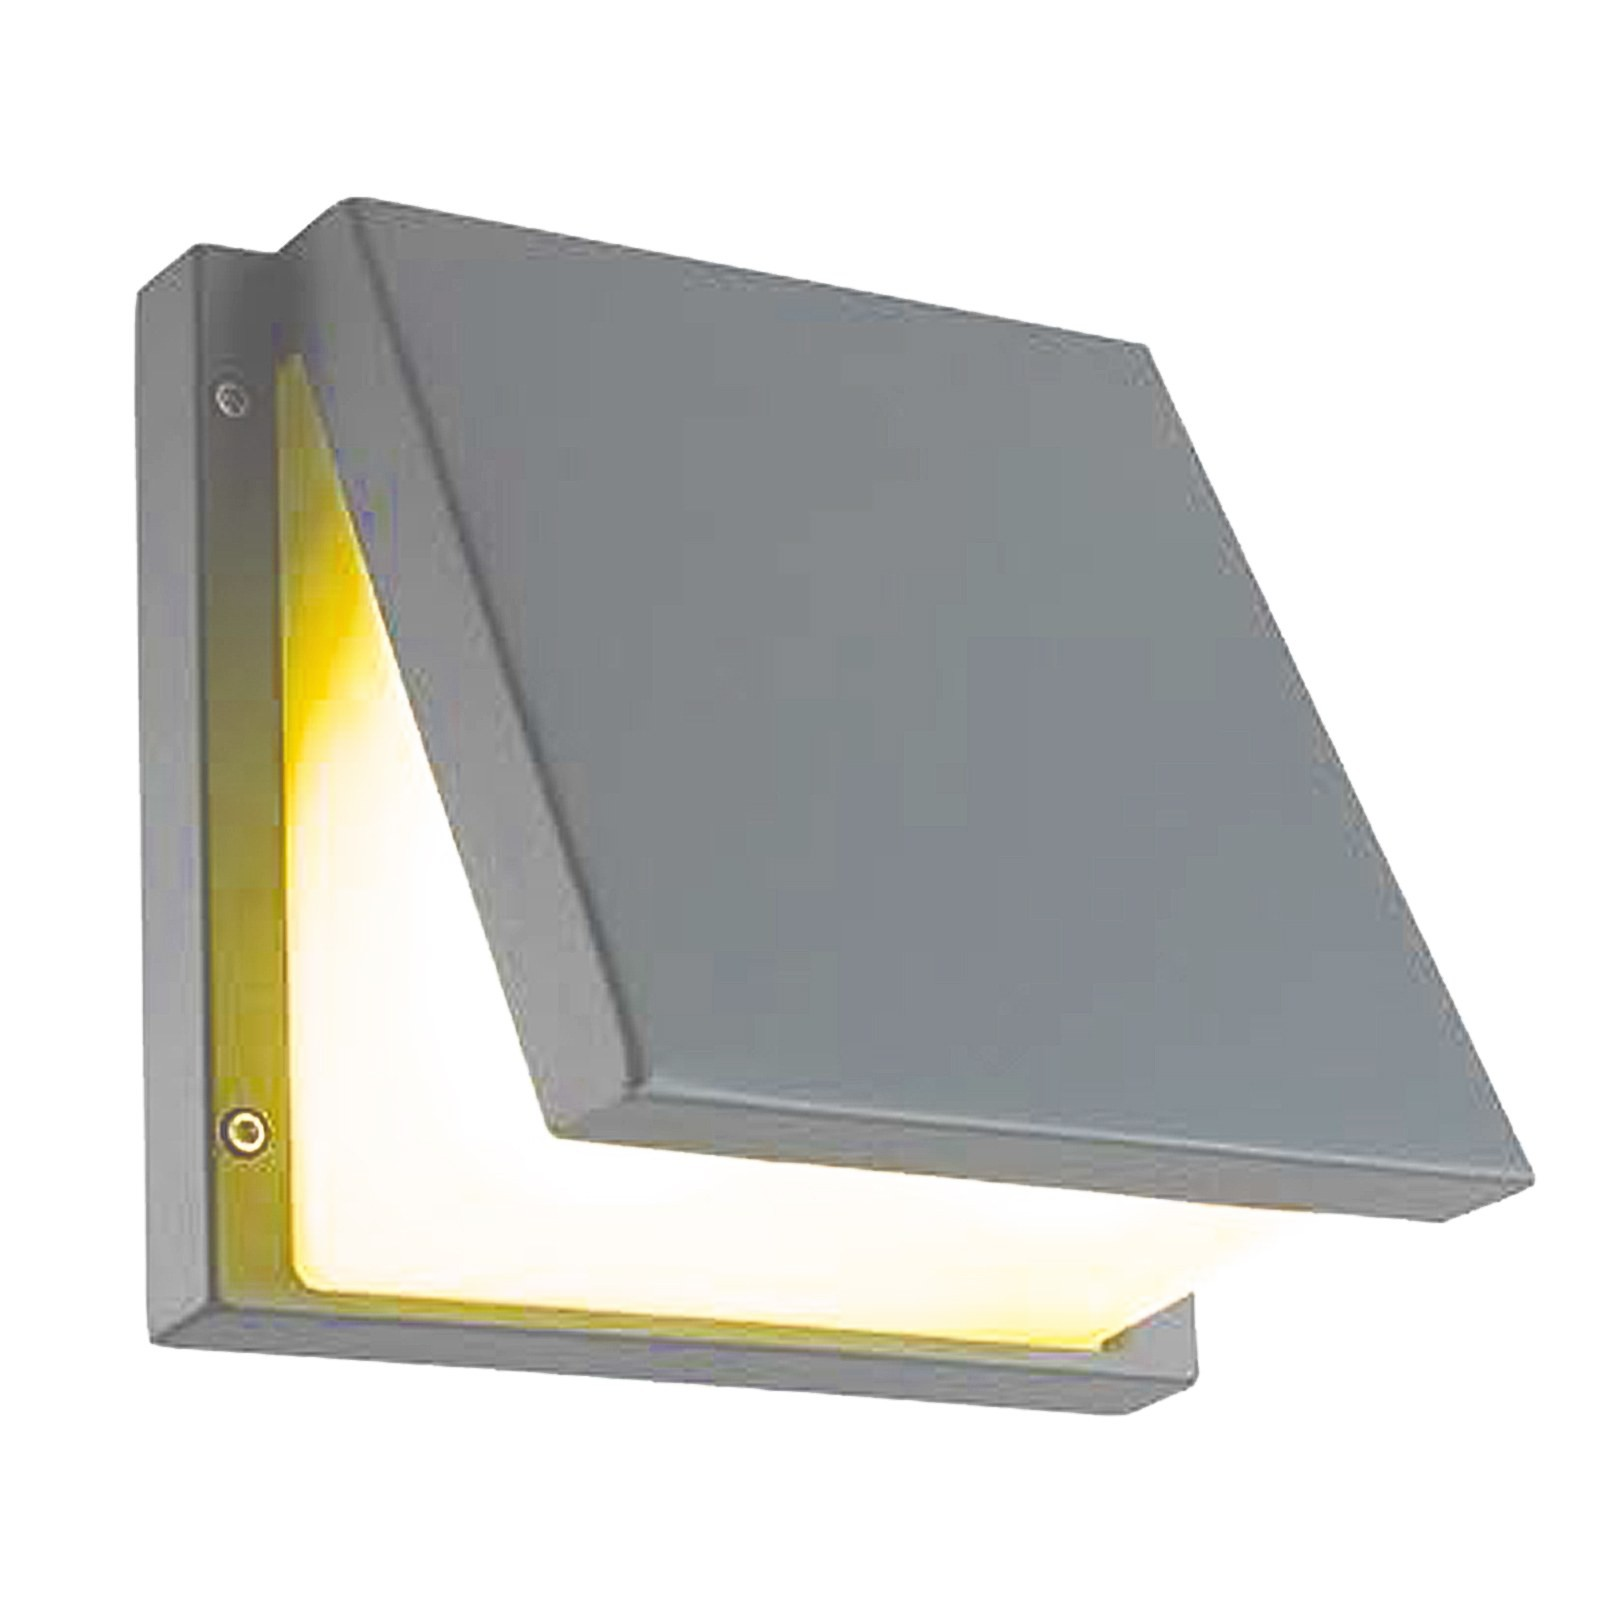 Lampada esterno plafoniera applique led e27 parete - Applique da esterno ikea ...